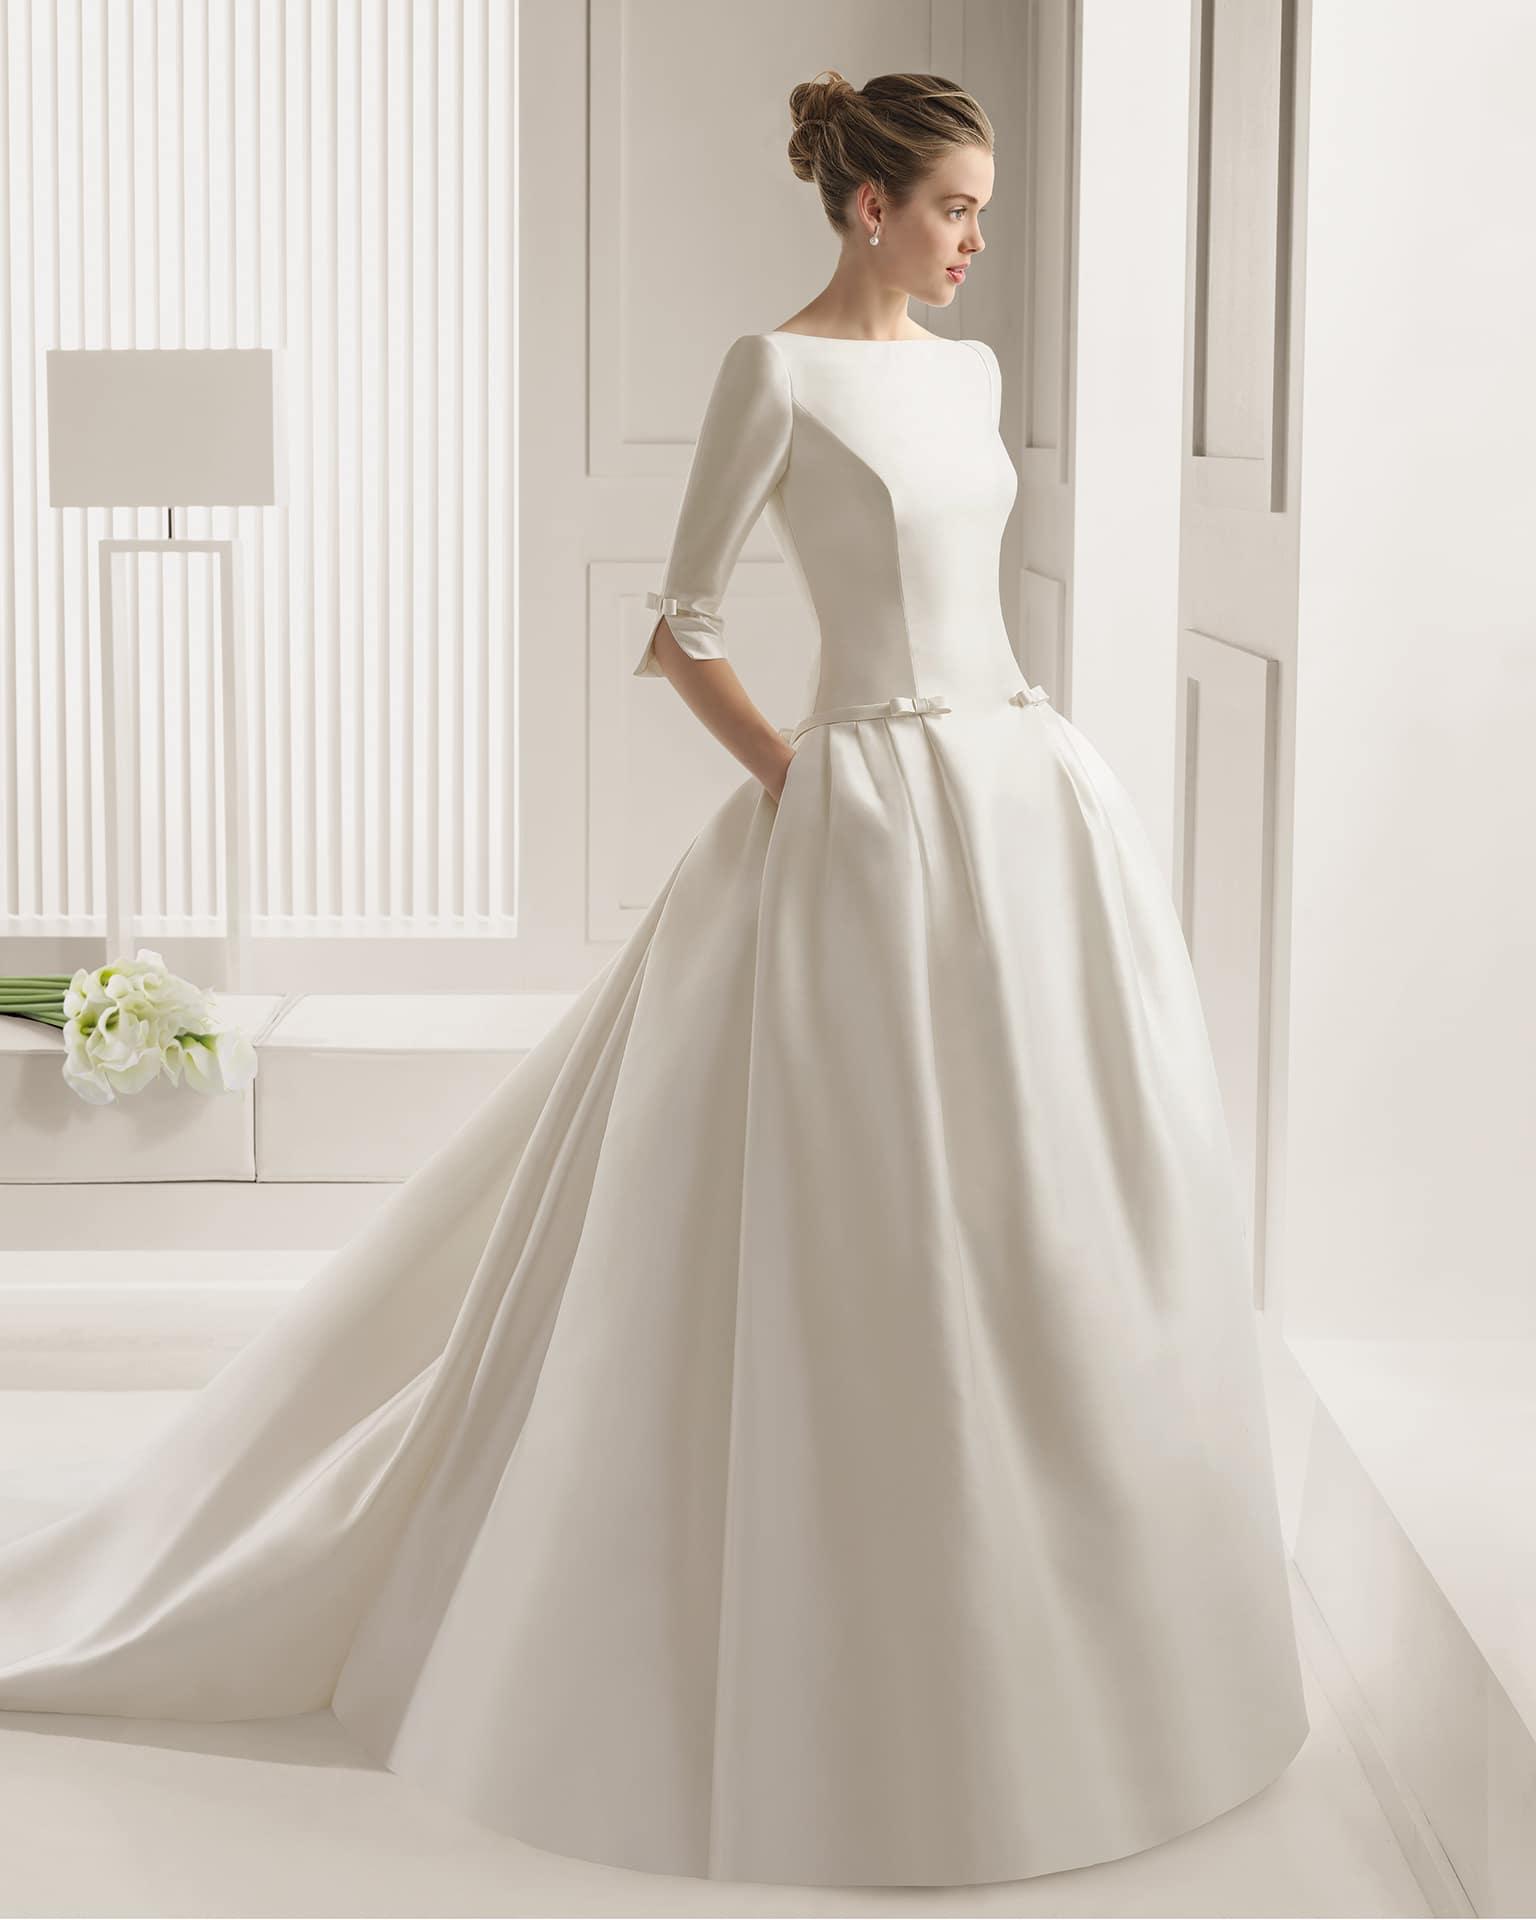 Winter Wedding Dress Ideas - SHE\'SAID\'